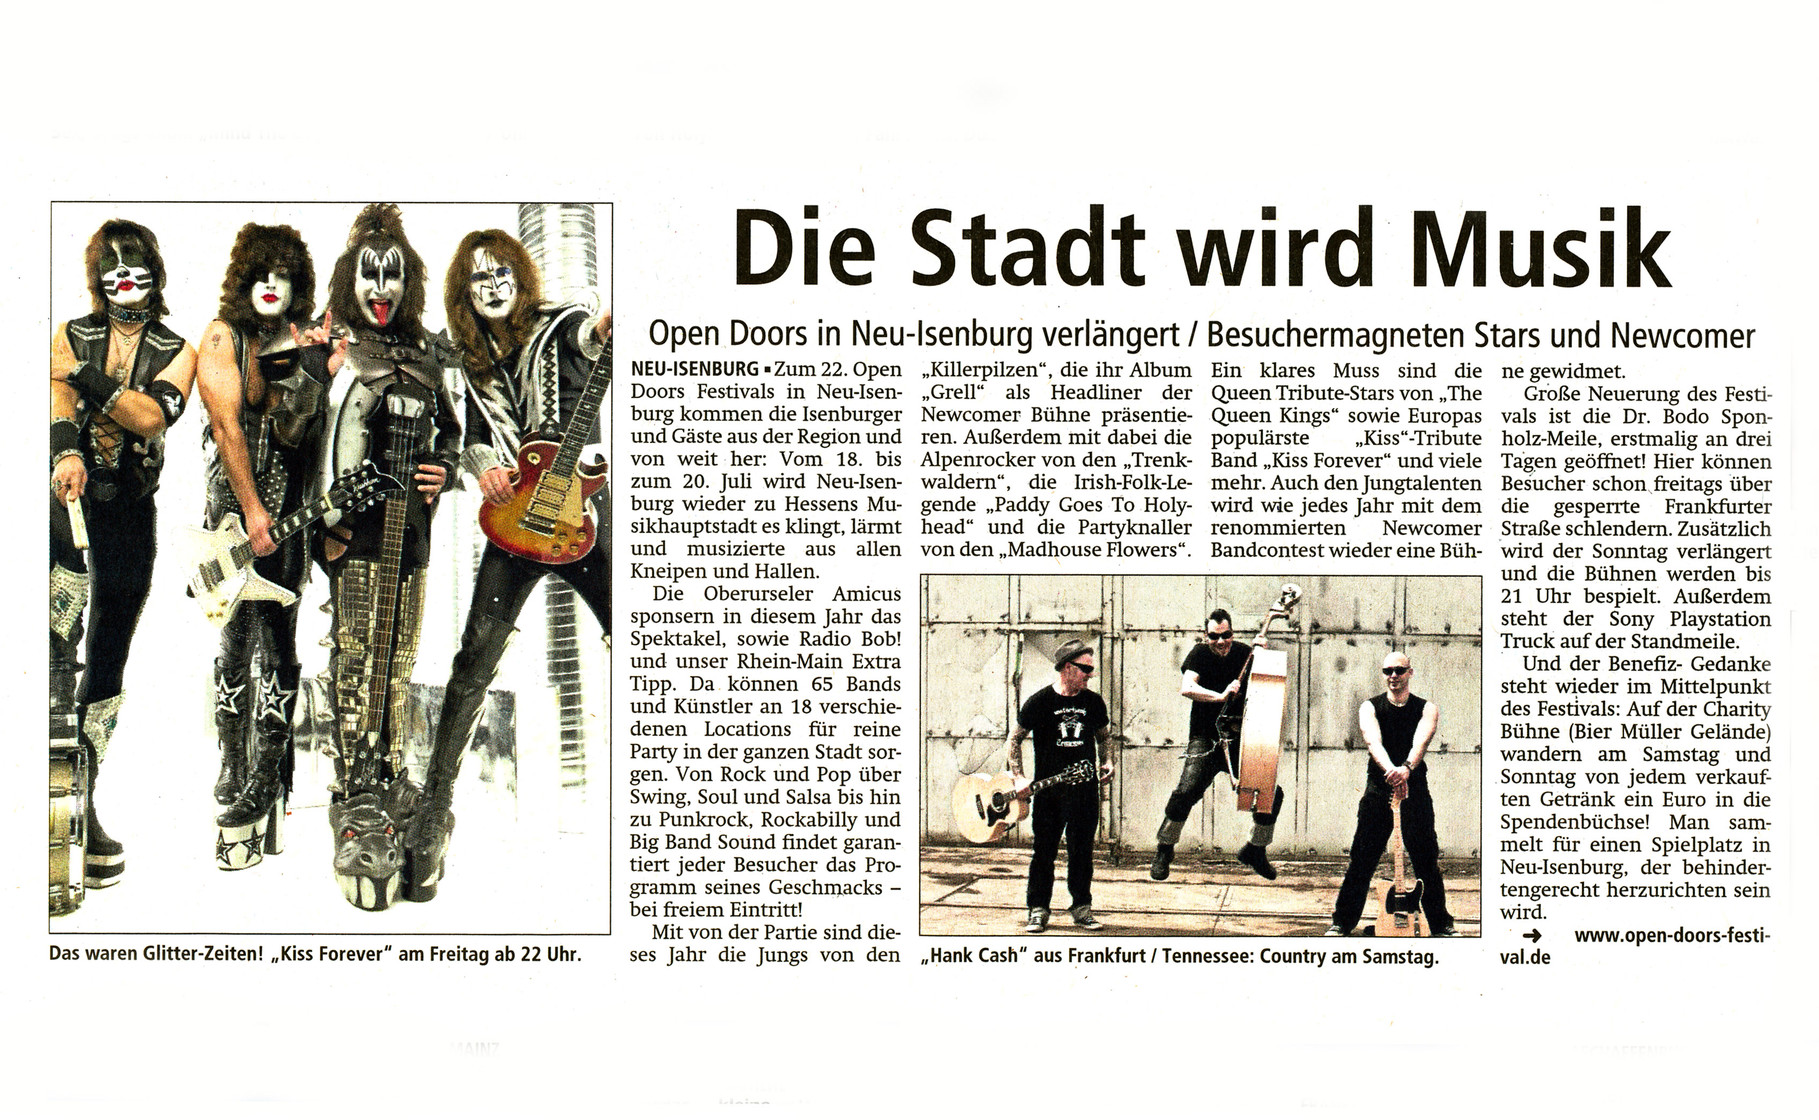 Offenbach Post, 5. Juli 2014